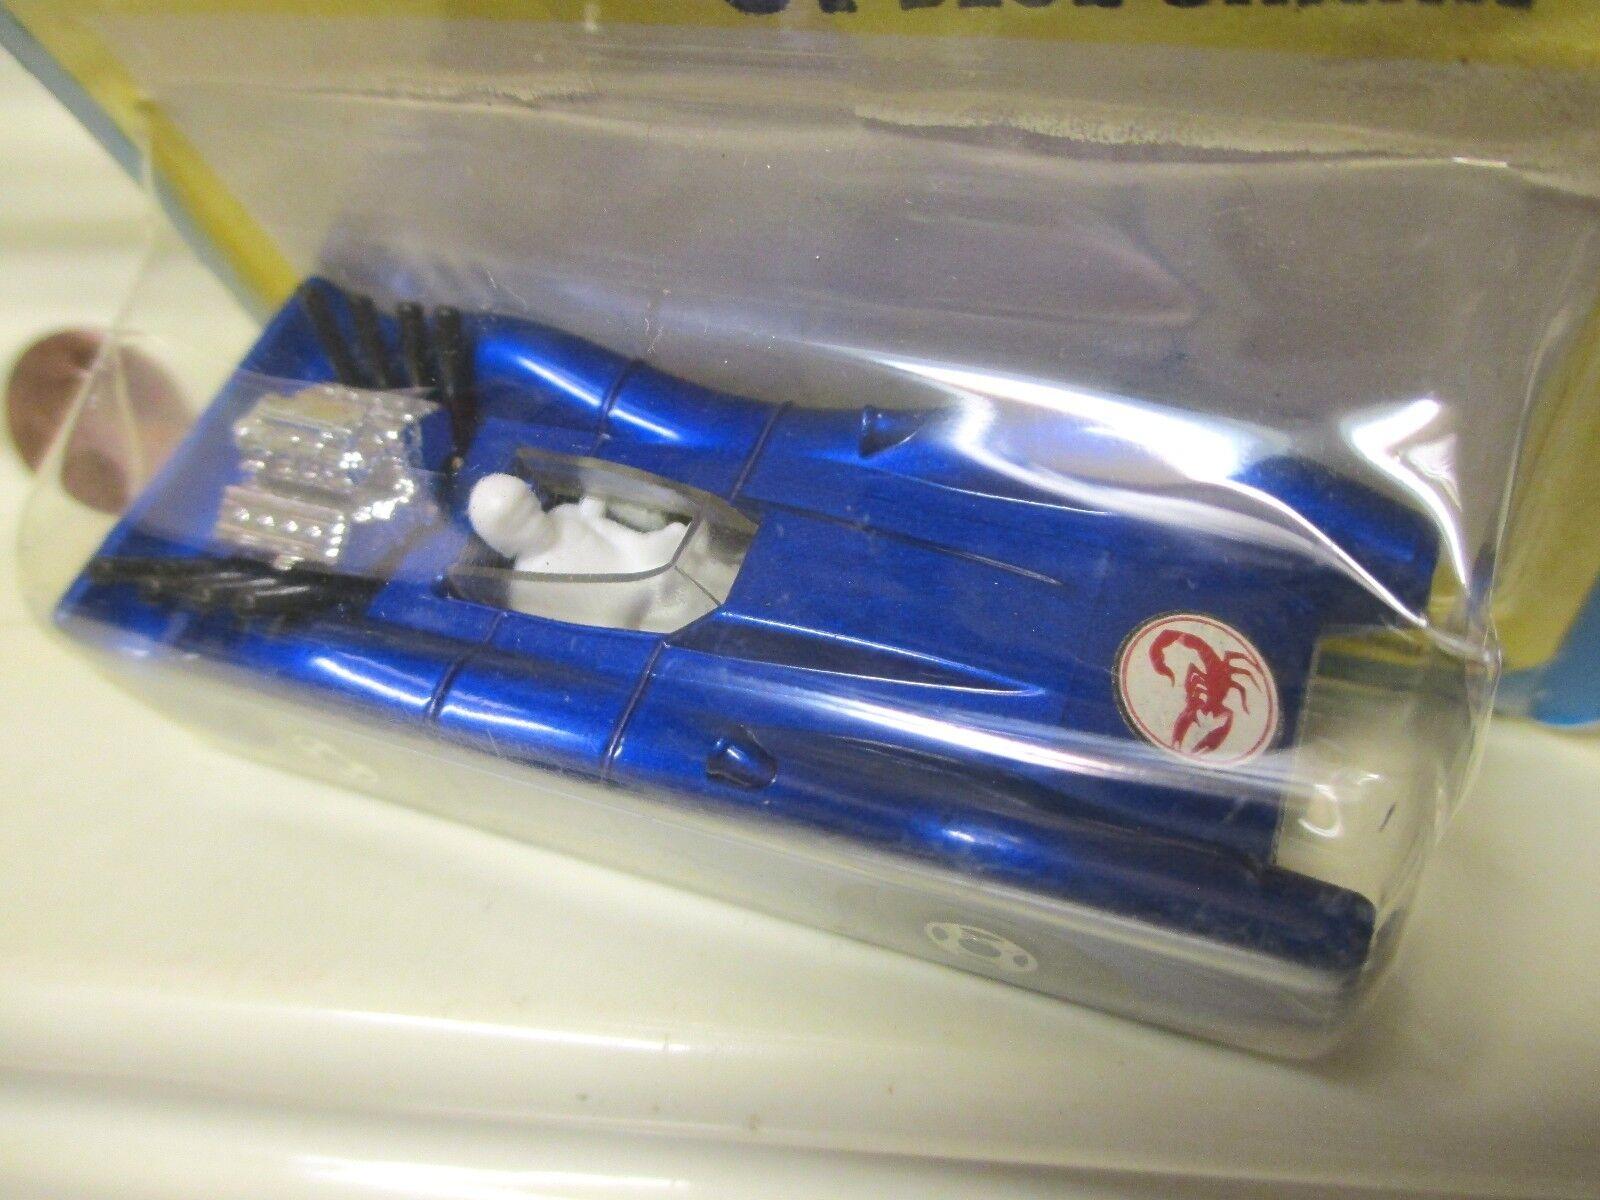 LESNEY MATCHBOX 1971 MB61A blu SHARK With SCORPION LABEL + CLEAR WINDOW MIMP*